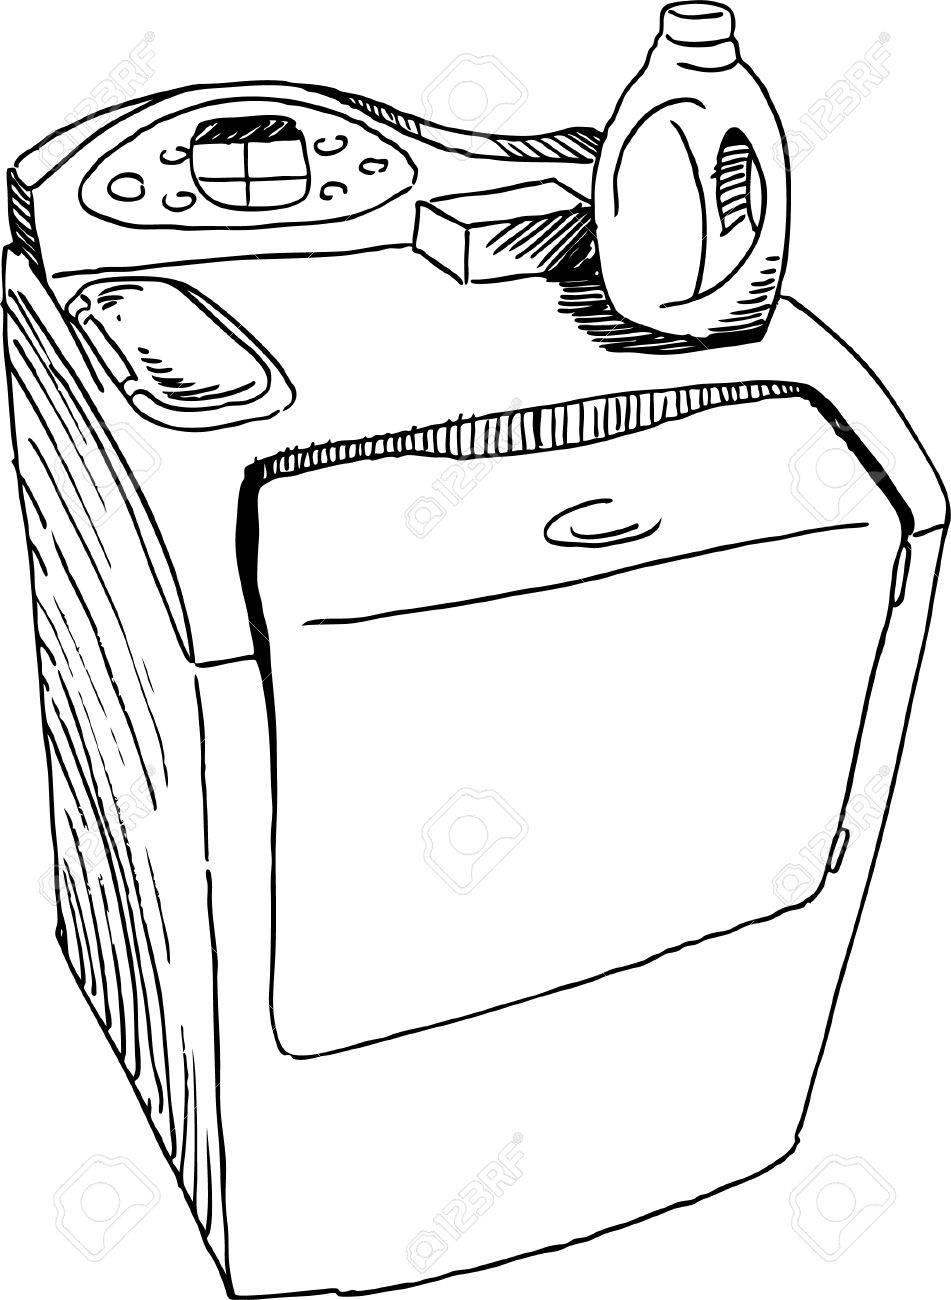 951x1300 Washing Machine Drawing Royalty Free Cliparts, Vectors, And Stock